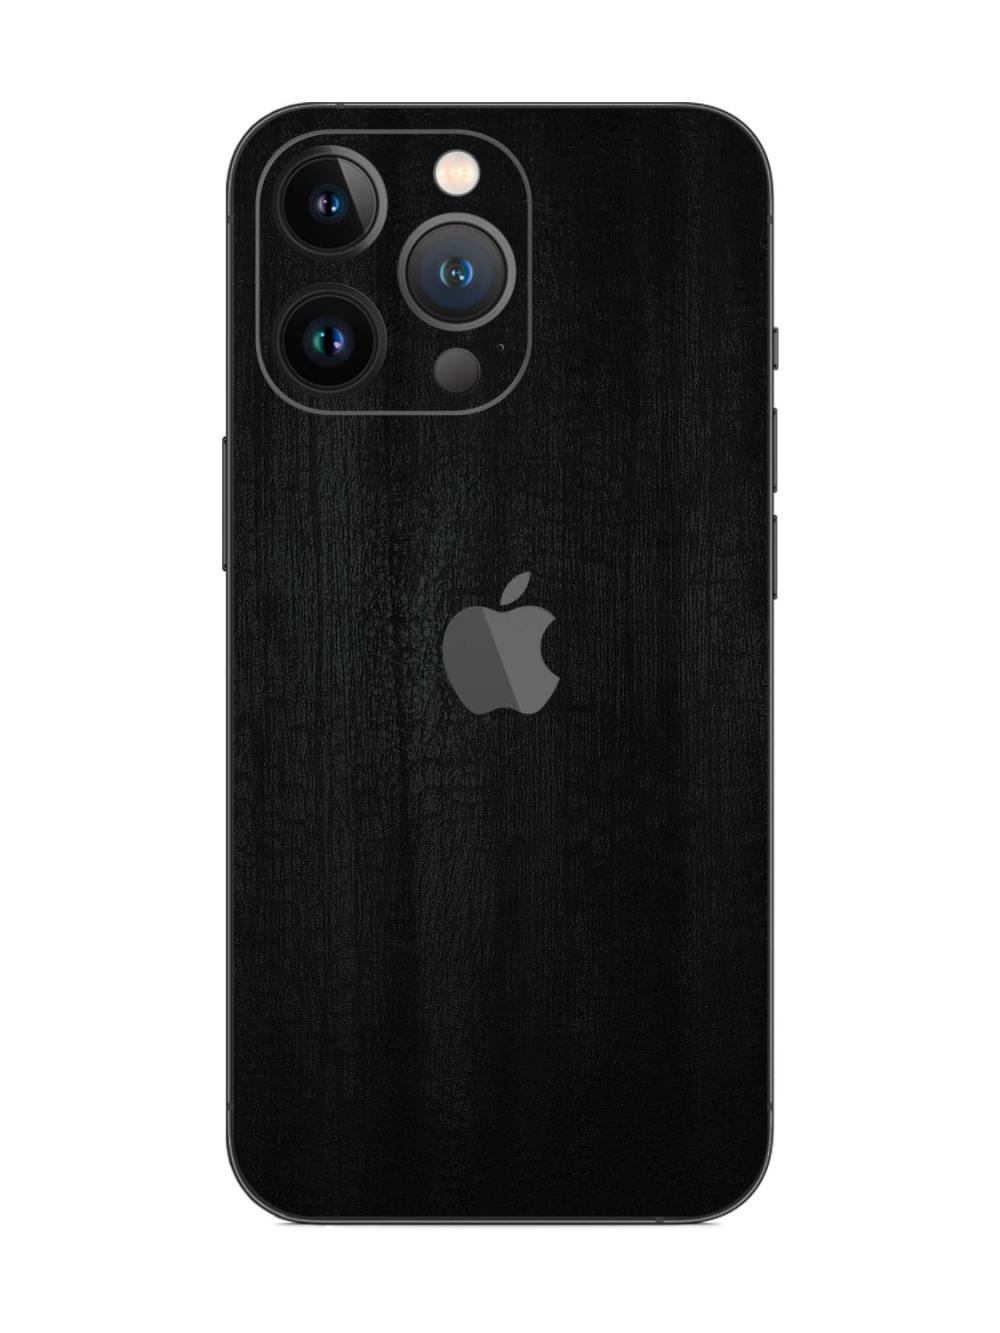 Apple iPhone 13 Pro Skin Wrap